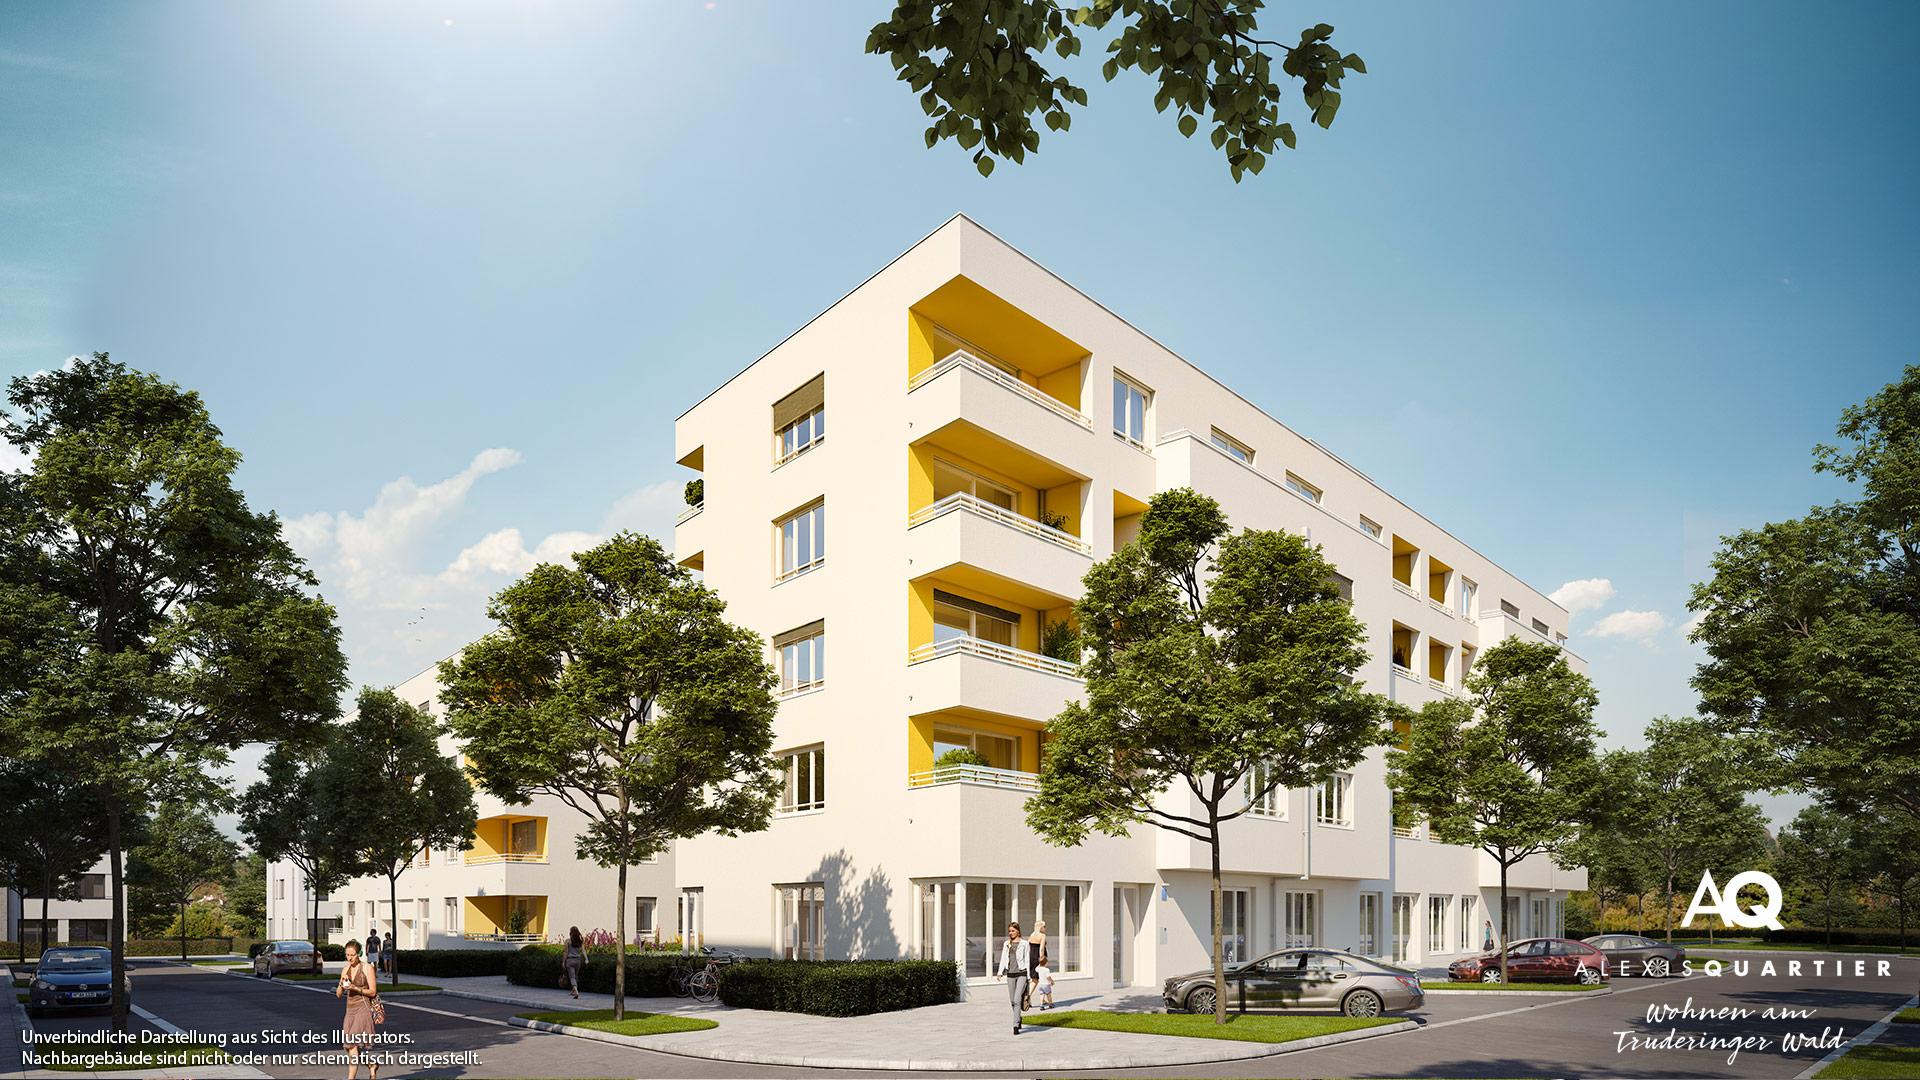 Immobilie Alexisquartier - Wohnen am Truderinger Wald - Illustration 1